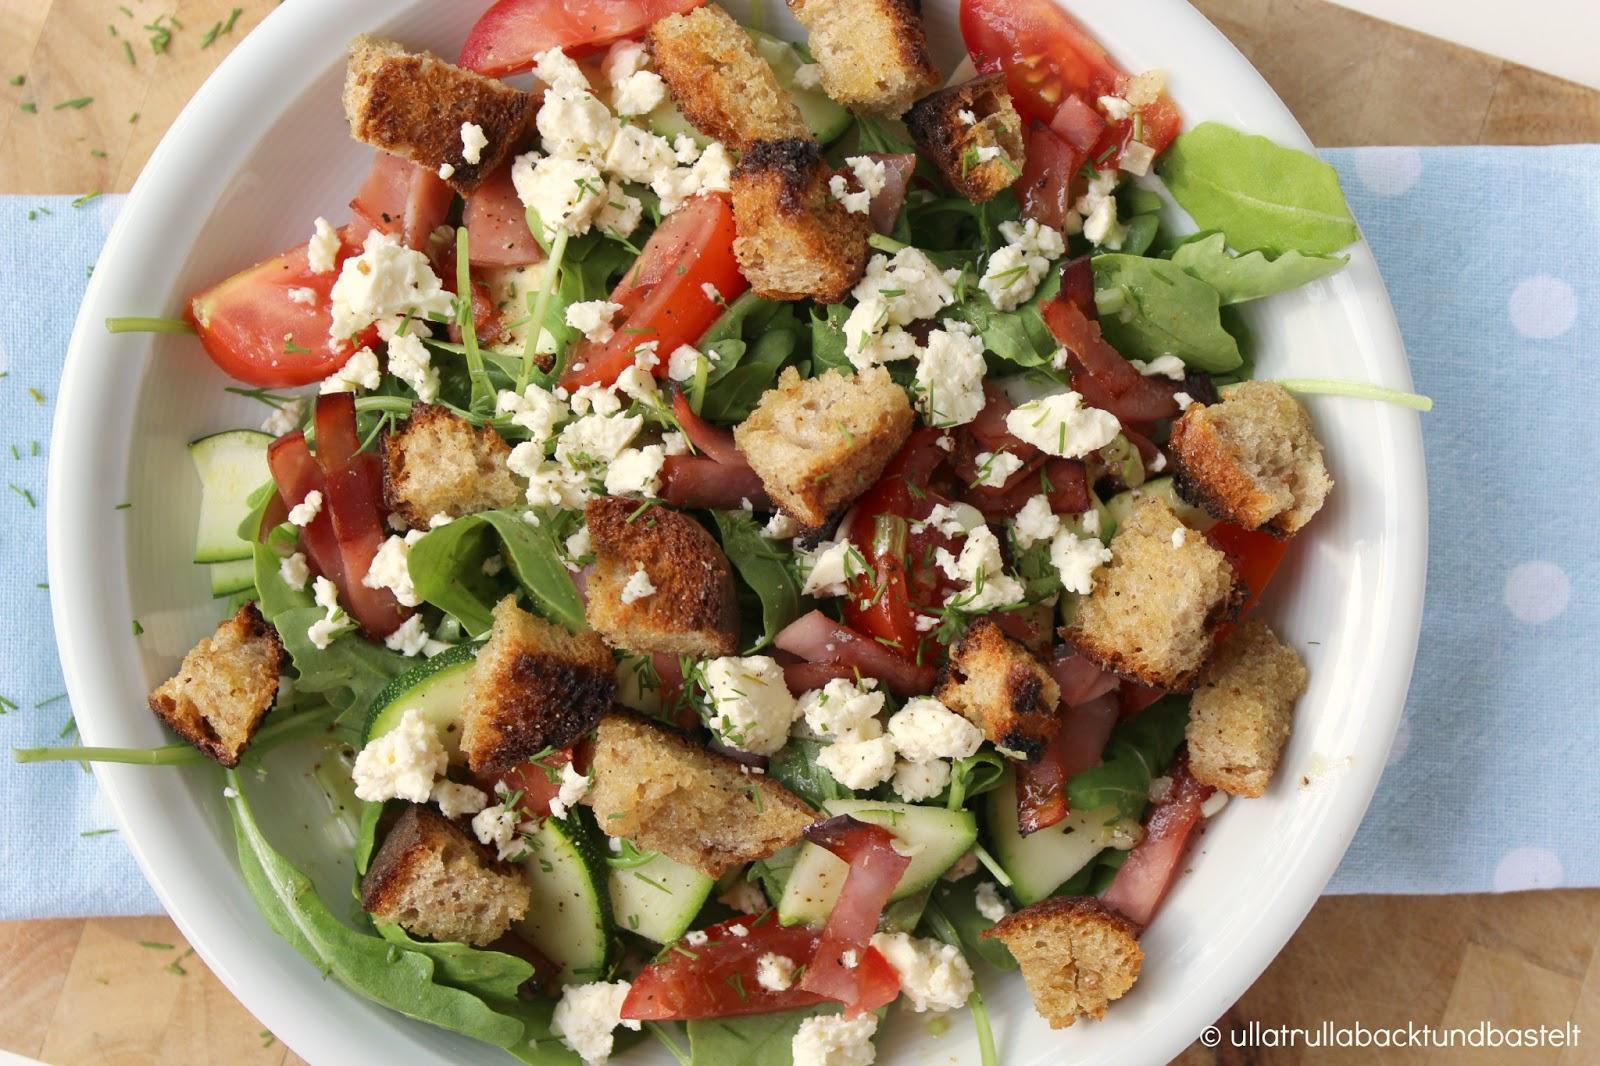 Ullatrulla backt und bastelt salat mal anders rezept for Kochen italienisch